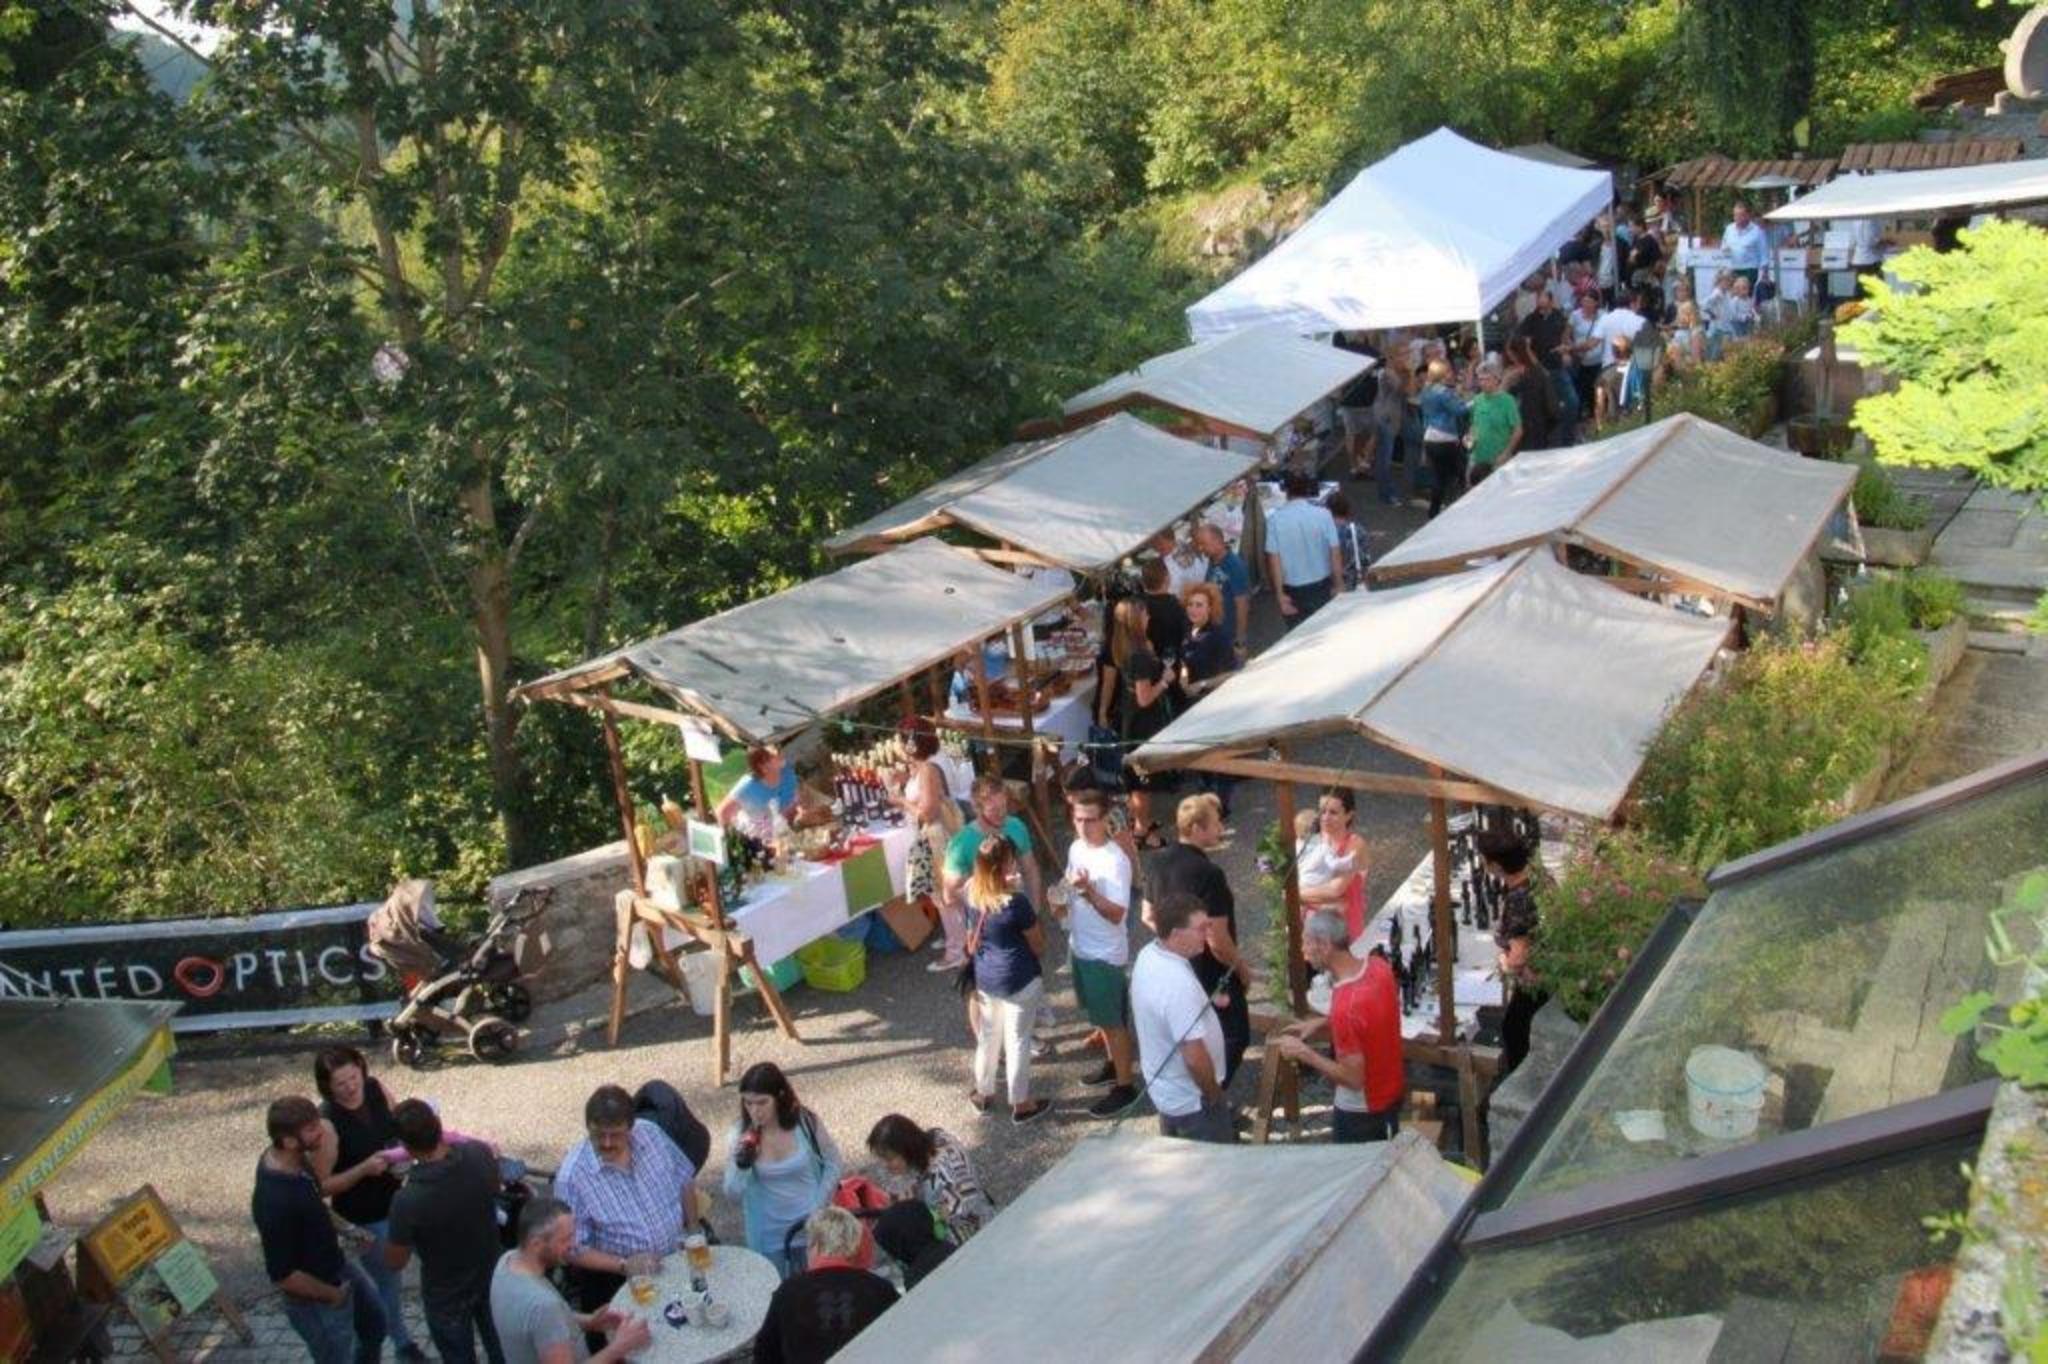 Moar-Resl-Fest - 28.07.2007 - im Moar-Resl Stadl - huggology.com